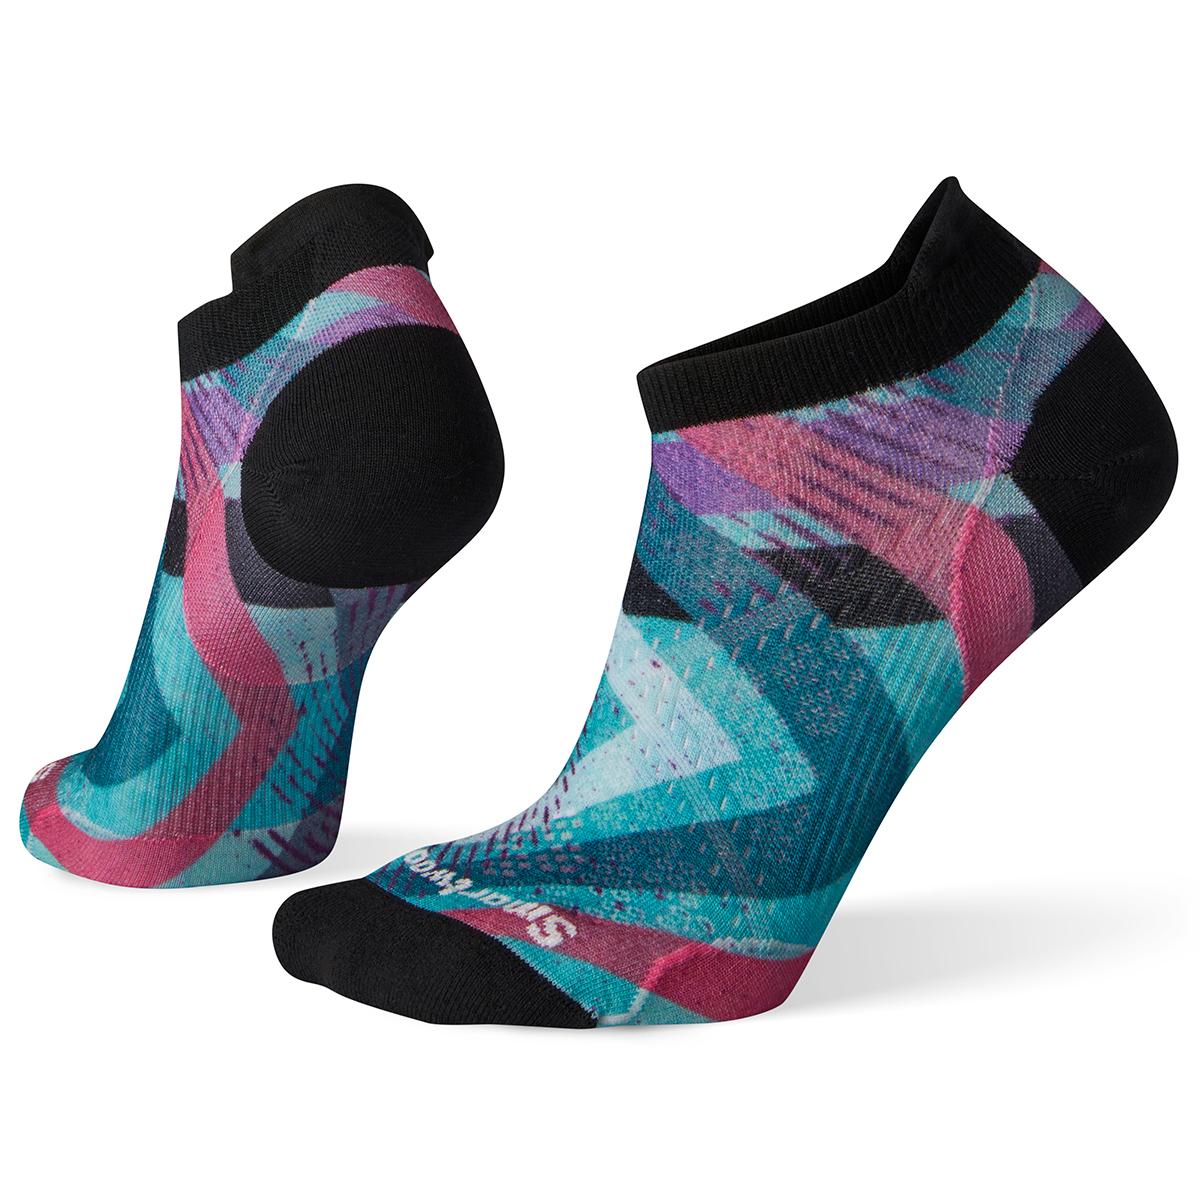 Smartwool Women's Phd Cycle Ultra Light Print Micro Socks - Purple, L